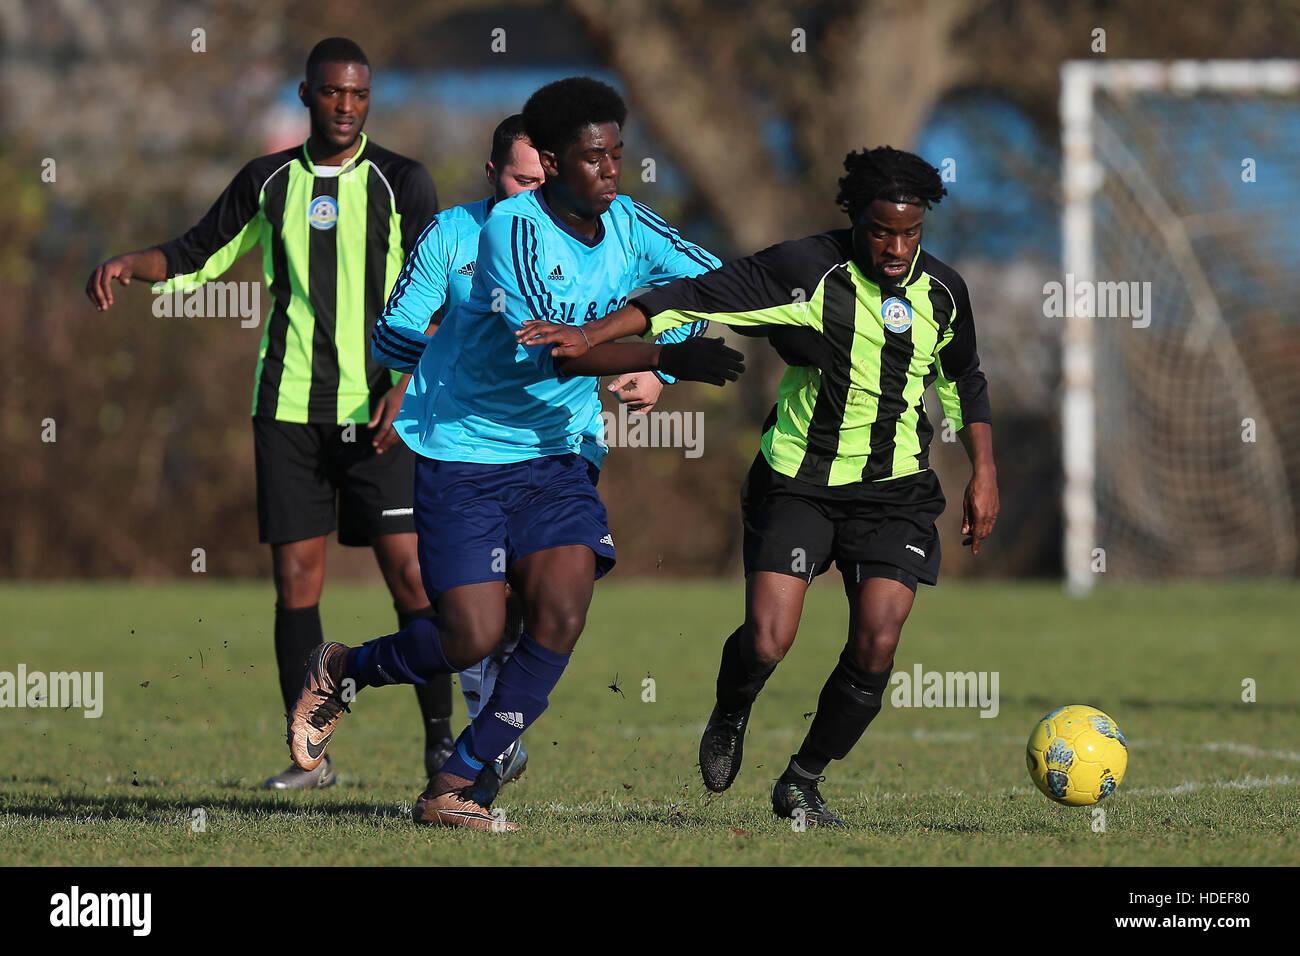 Eagle (green/black) vs Dynamics, Hackney & Leyton Sunday League Football at Hackney Marshes on 11th December - Stock Image